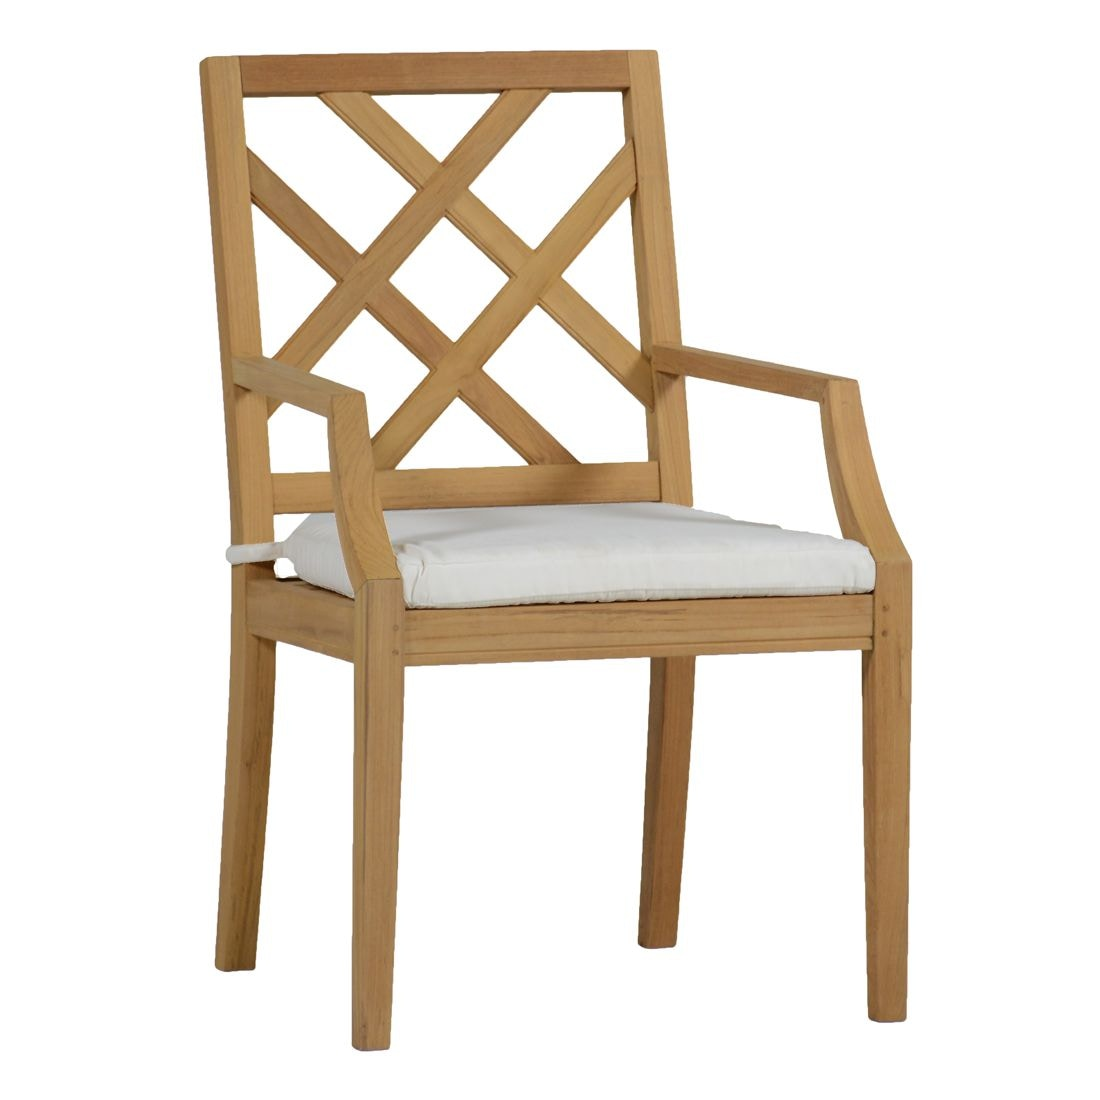 Summer Classics Outdoor/Patio Haley Arm Chair 29454   Birmingham Wholesale  Furniture   Birmingham, AL